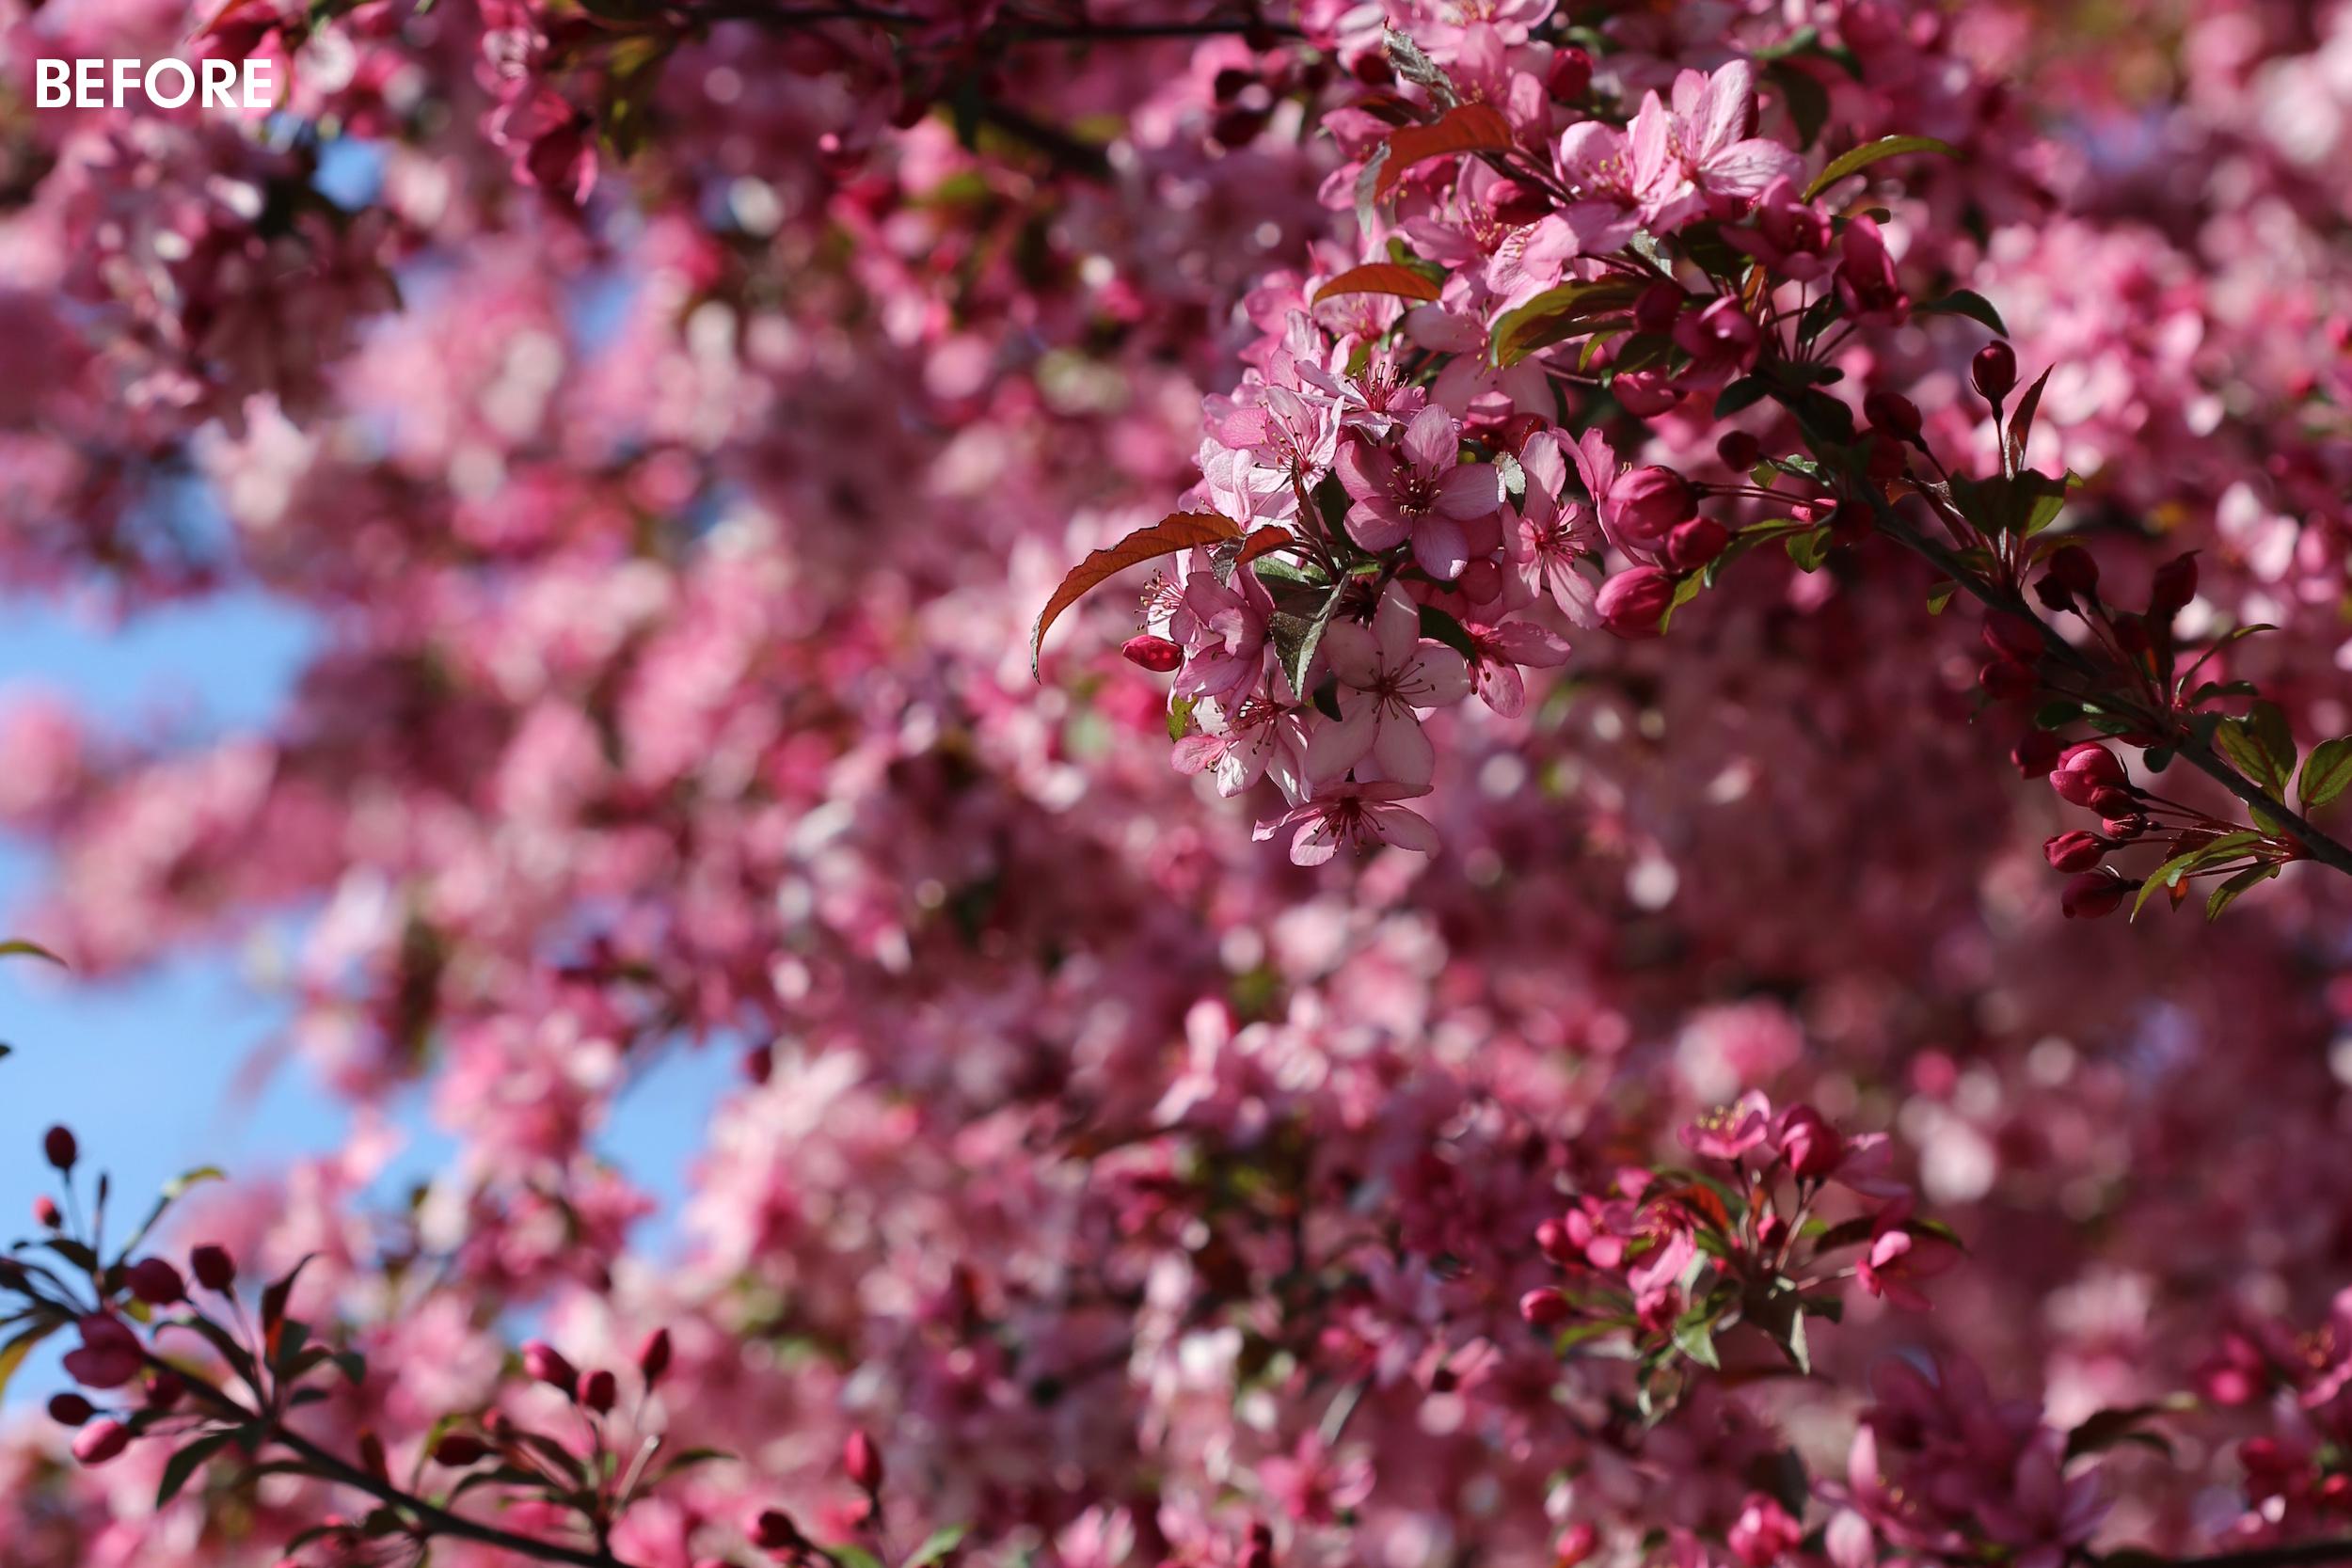 pink-flower-treechickpeach-lightroom-presets11.jpg